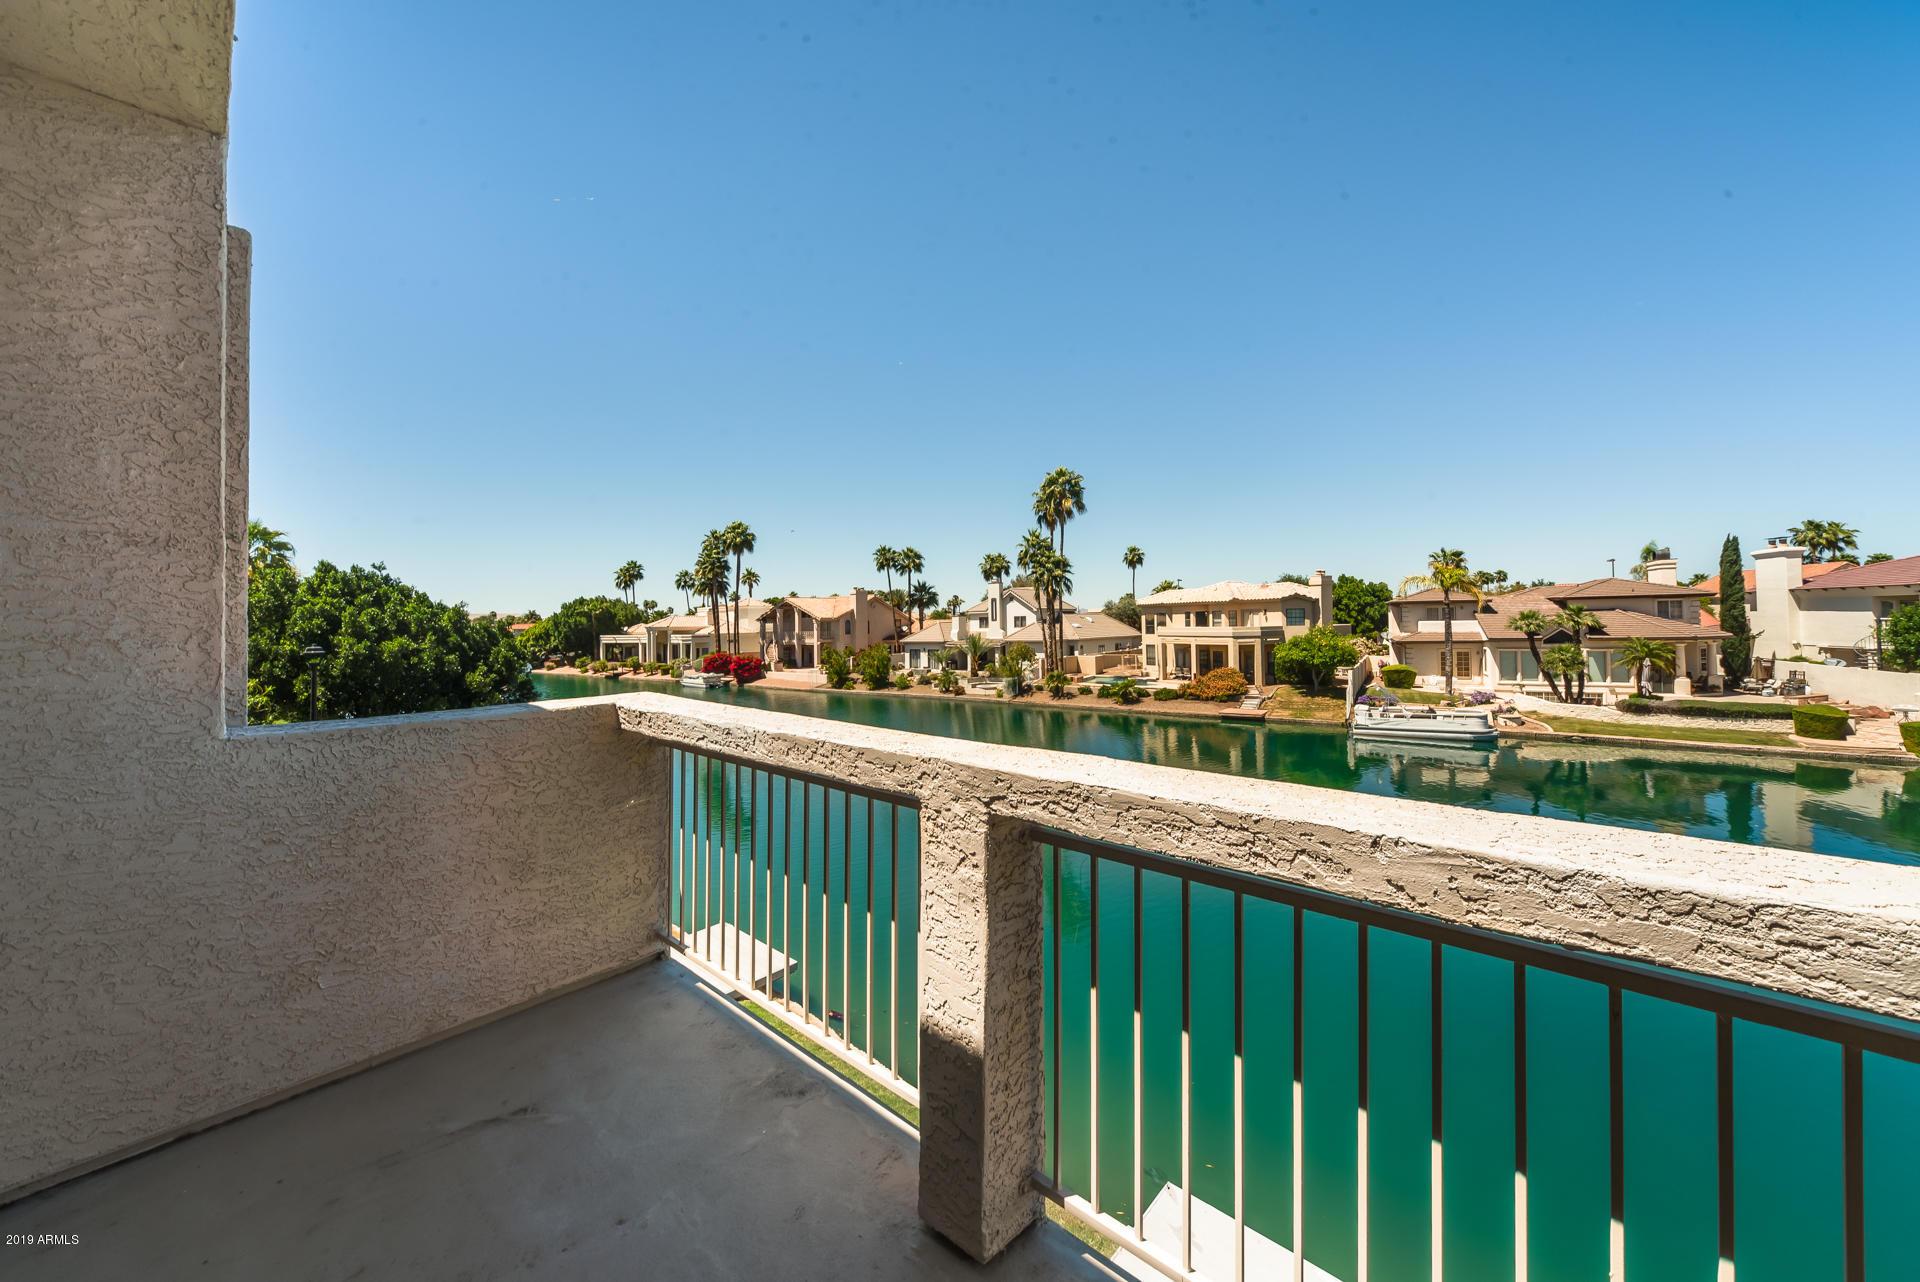 MLS 5914005 1342 W CORAL REEF Drive, Gilbert, AZ 85233 Condos